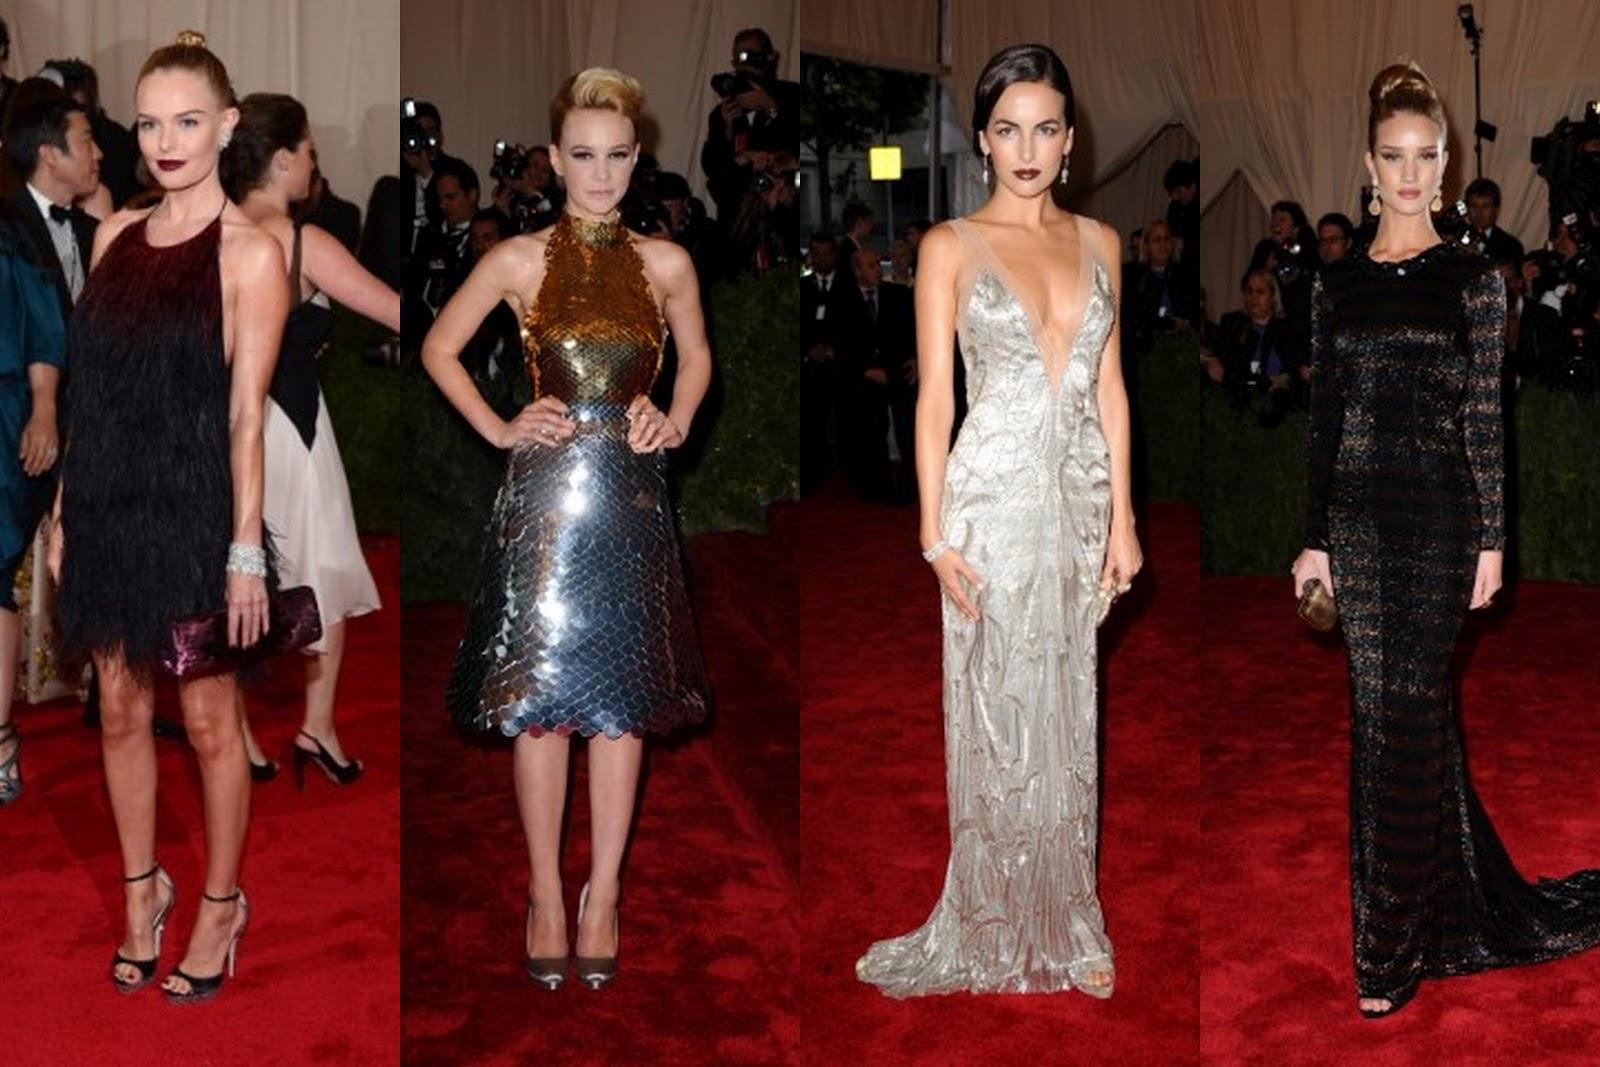 http://1.bp.blogspot.com/-RqUPp6Y1TSg/T6jb62c-wCI/AAAAAAAAAtg/5-4SXJXx2rY/s1600/Dresses_MET_Gala_2012.jpg